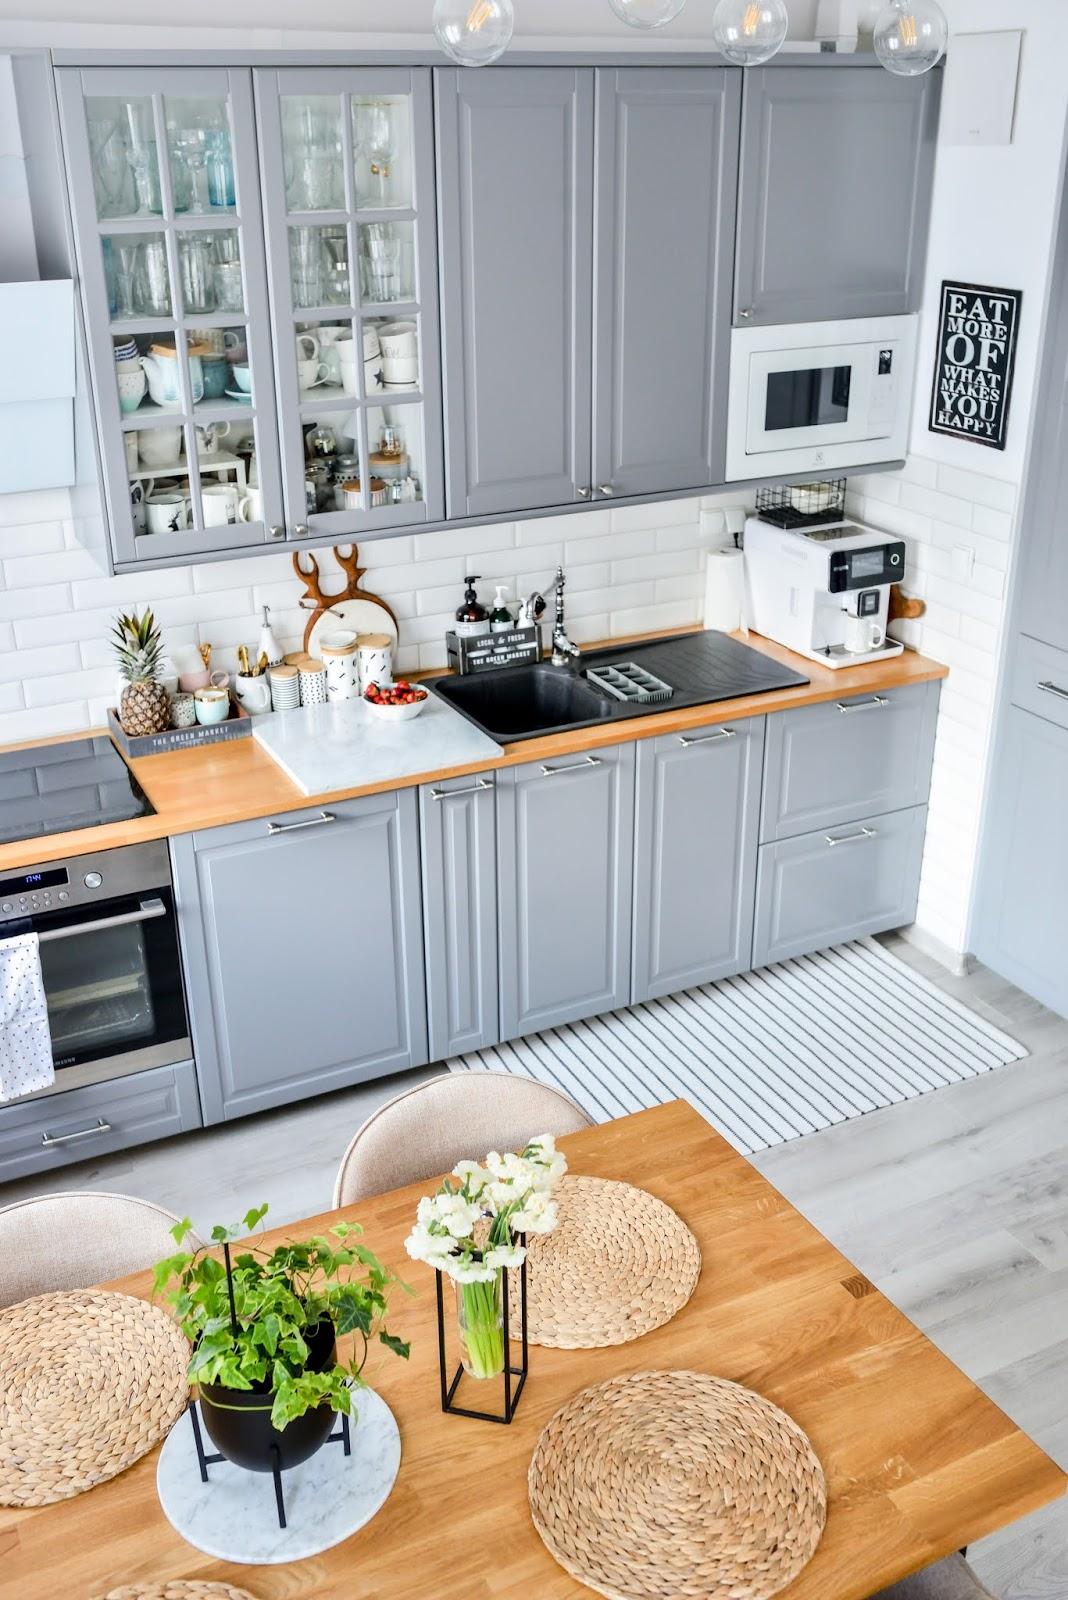 Organizacja Kuchni Z Ikea Funkcjonalnosc I Wygoda Smykwkuchni